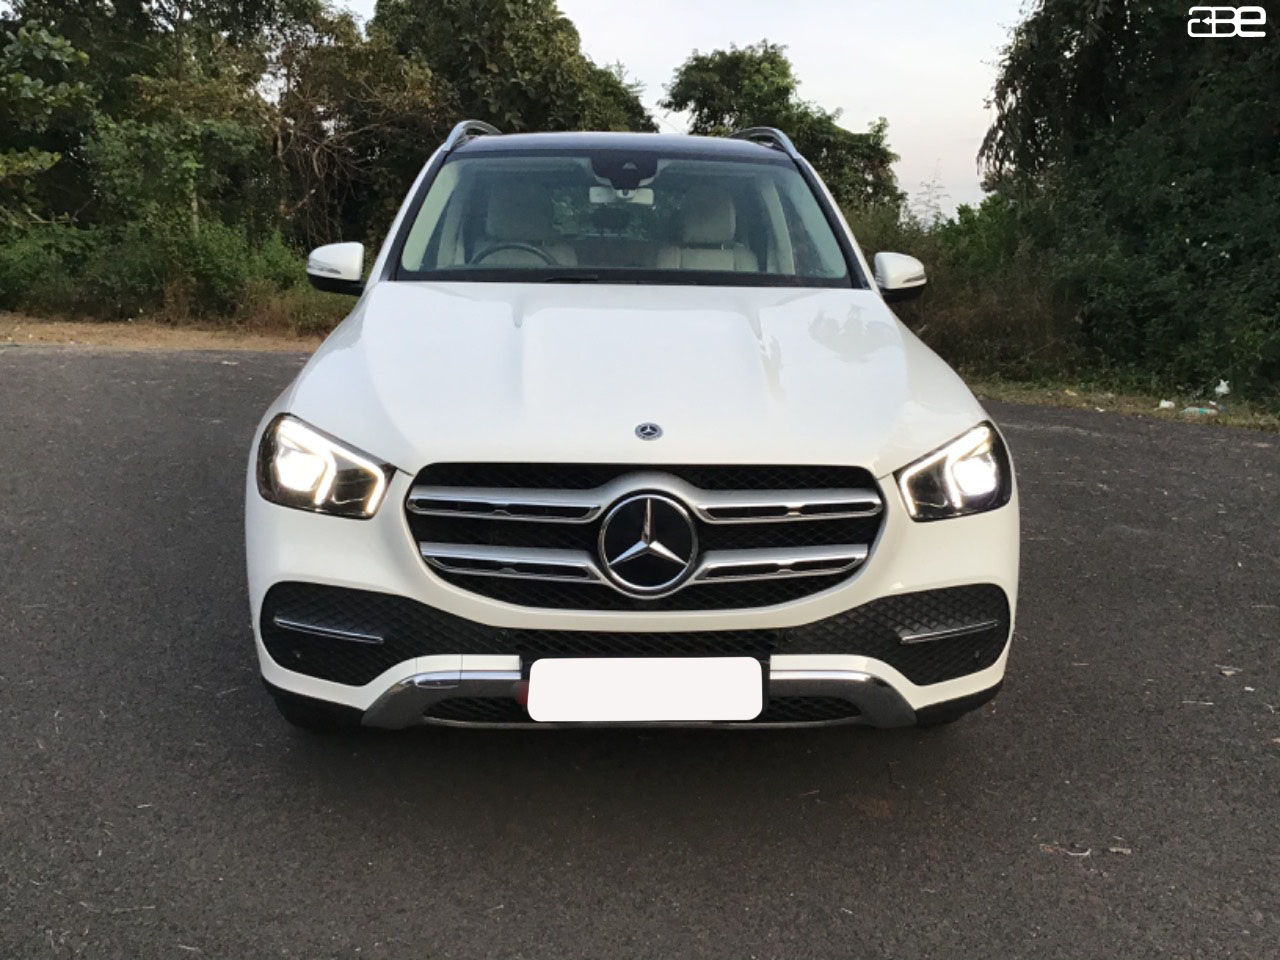 Mercedes-Benz GLE 300 D (4-MATIC) LWB